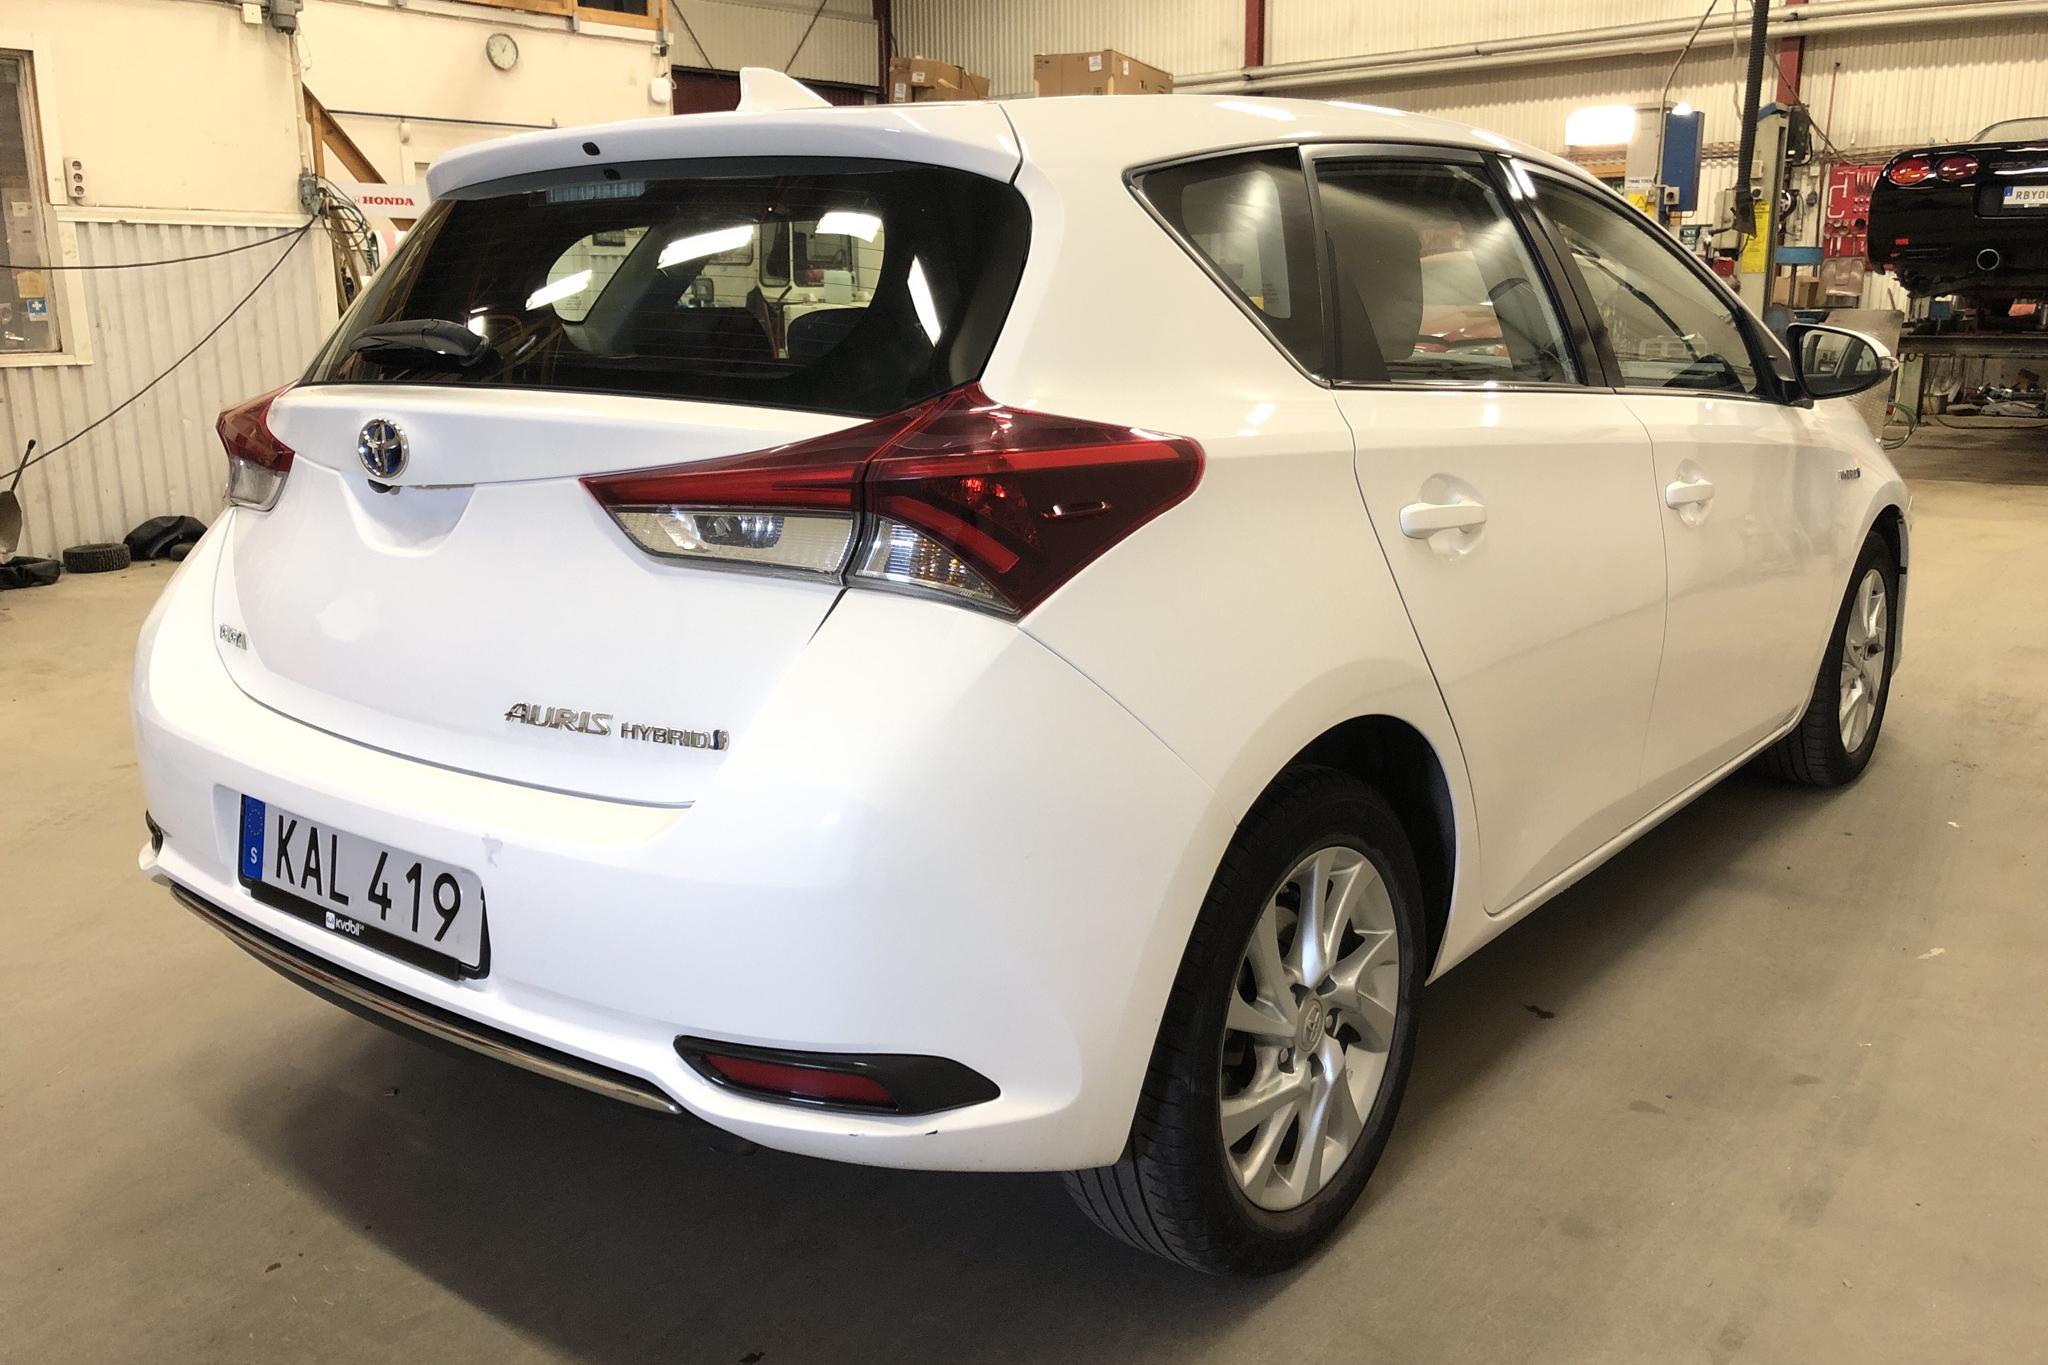 Toyota Auris 1.8 HSD 5dr (99hk) - 46 910 km - Automatic - white - 2016